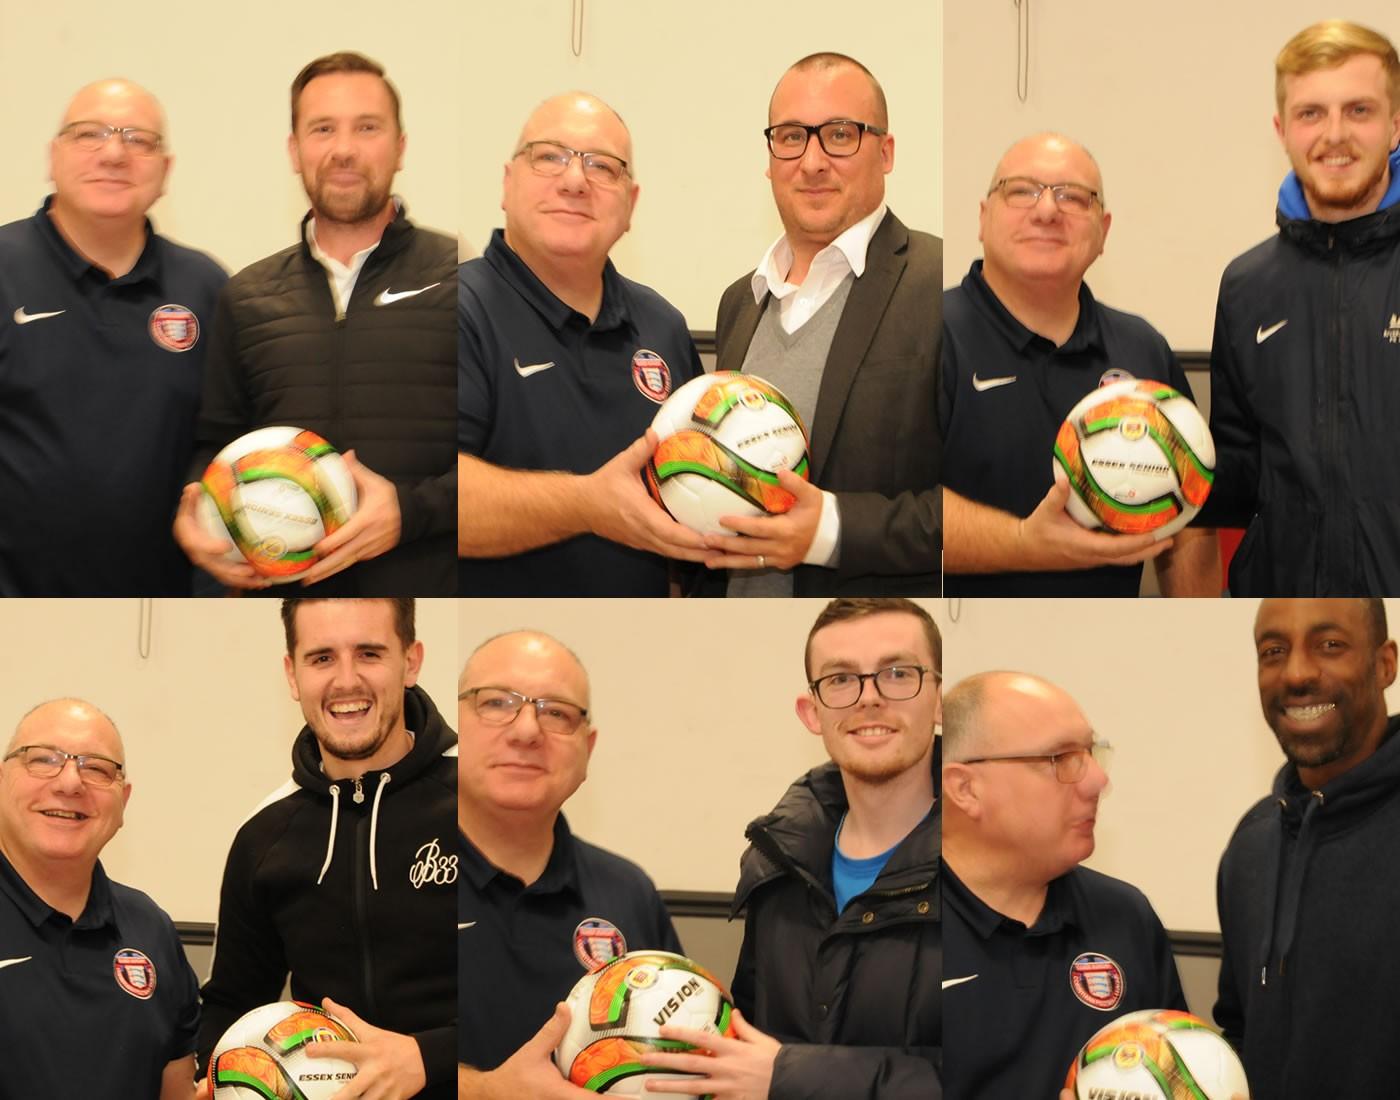 Congratulations to latest sportsmanship award winners